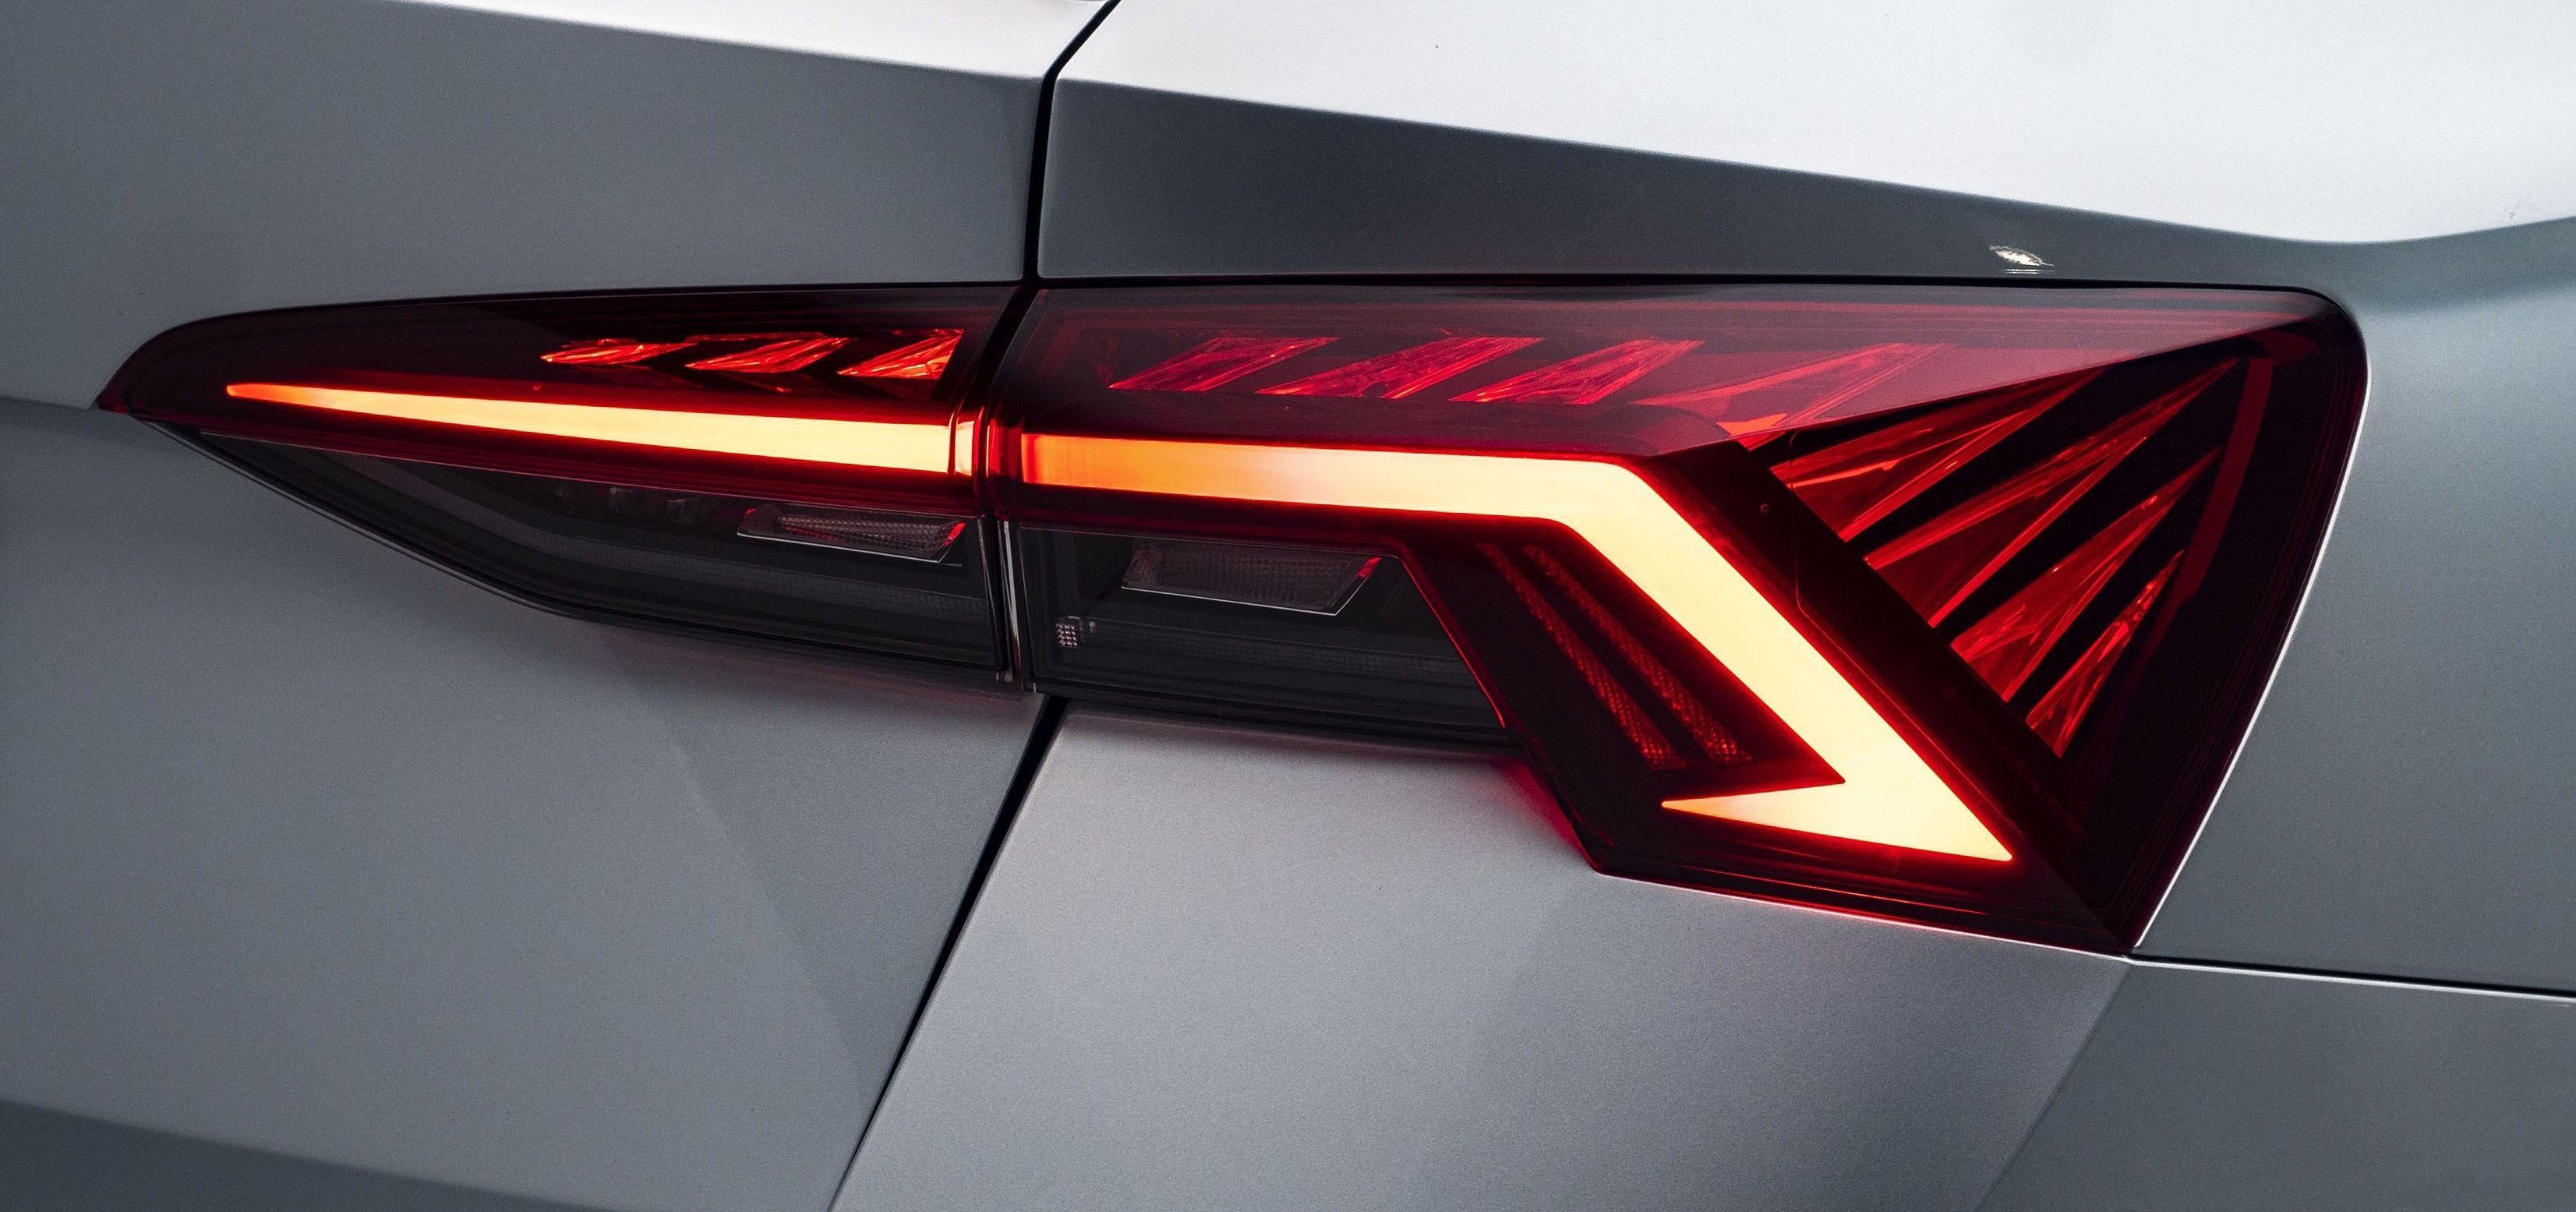 Pin By Shaun Gallegos Brand X Fab On Lamp Design Car In 2020 Lamp Lamp Design Lighting Design